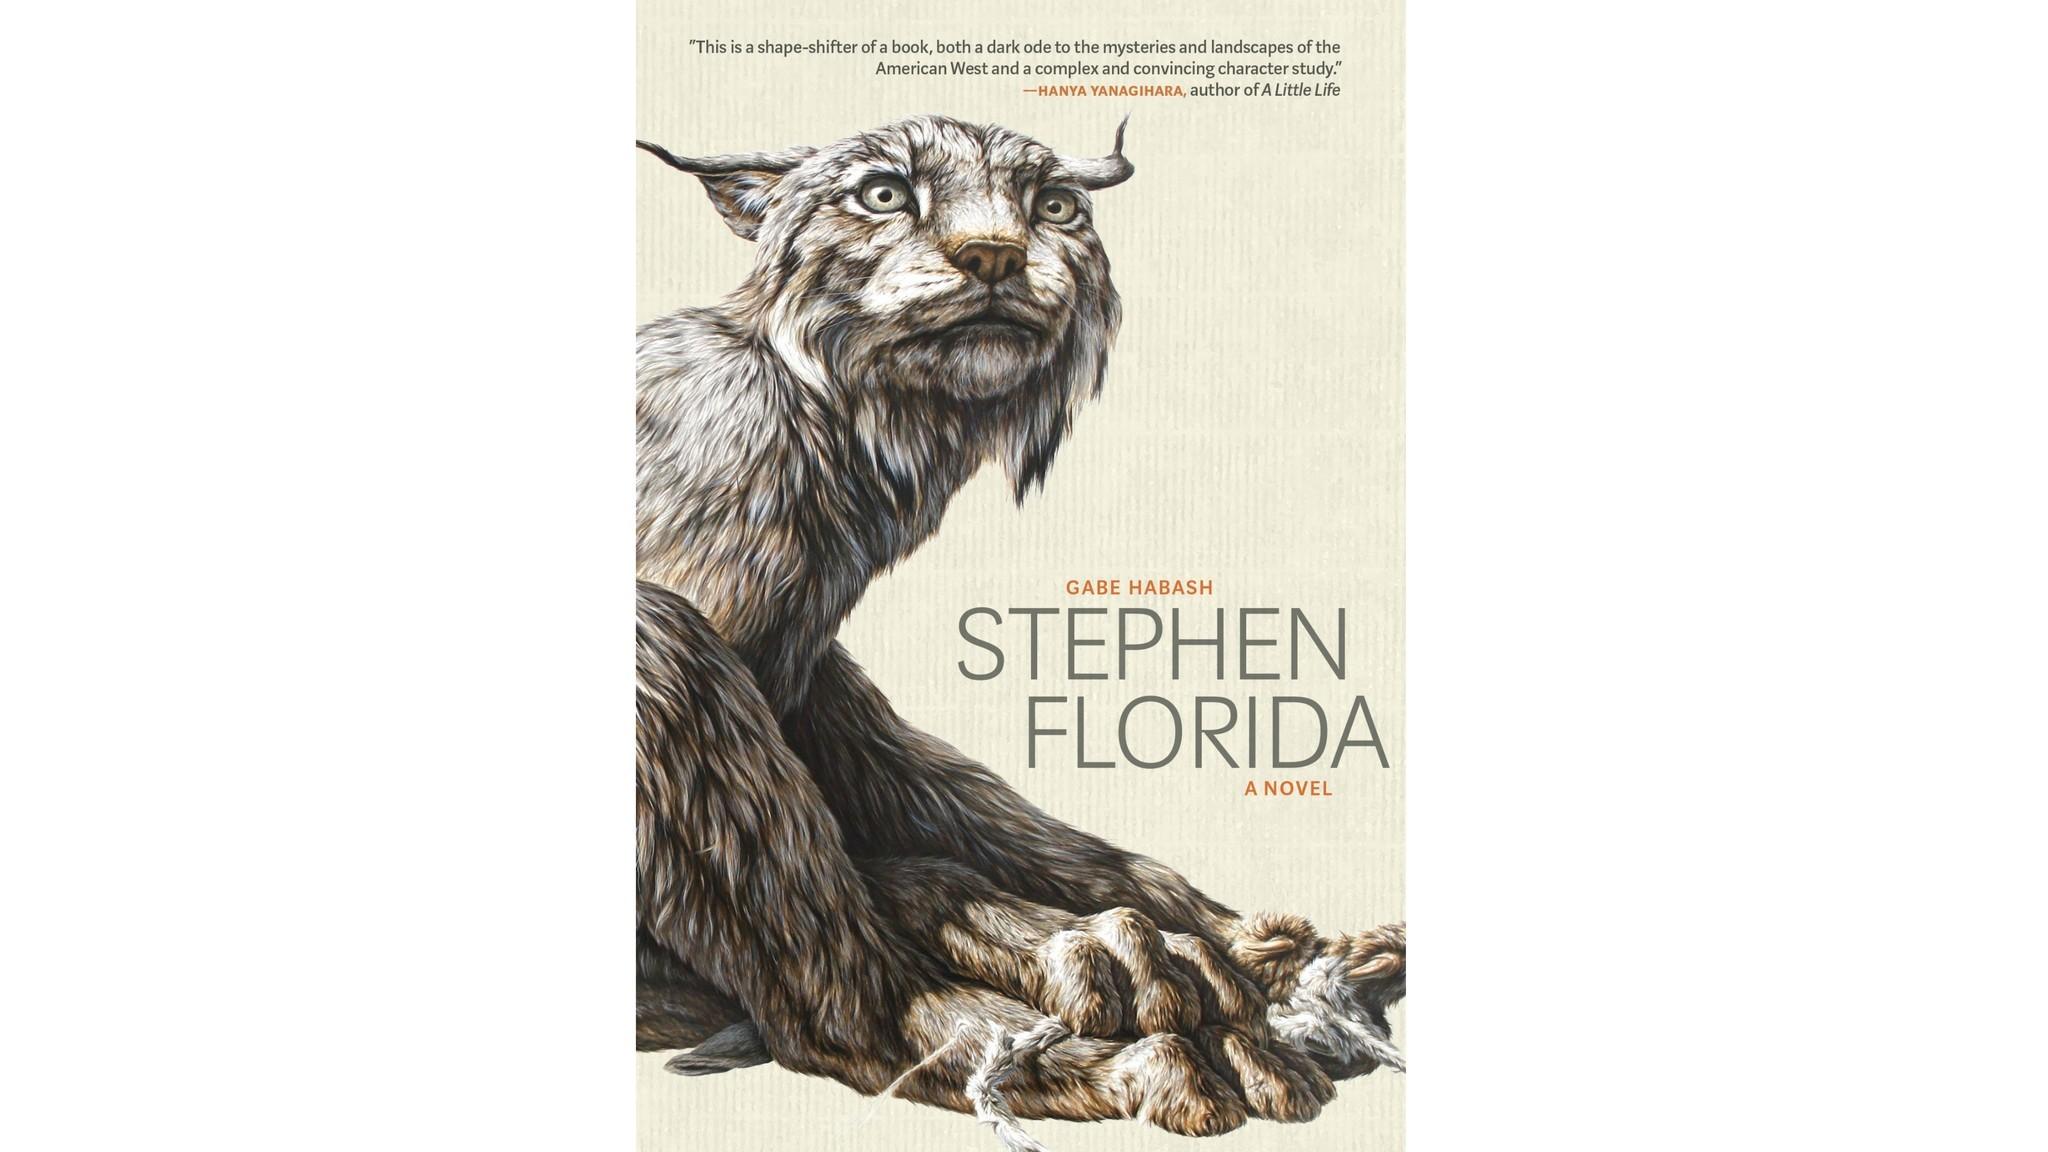 """Stephen Florida"" by Gabe Habash."